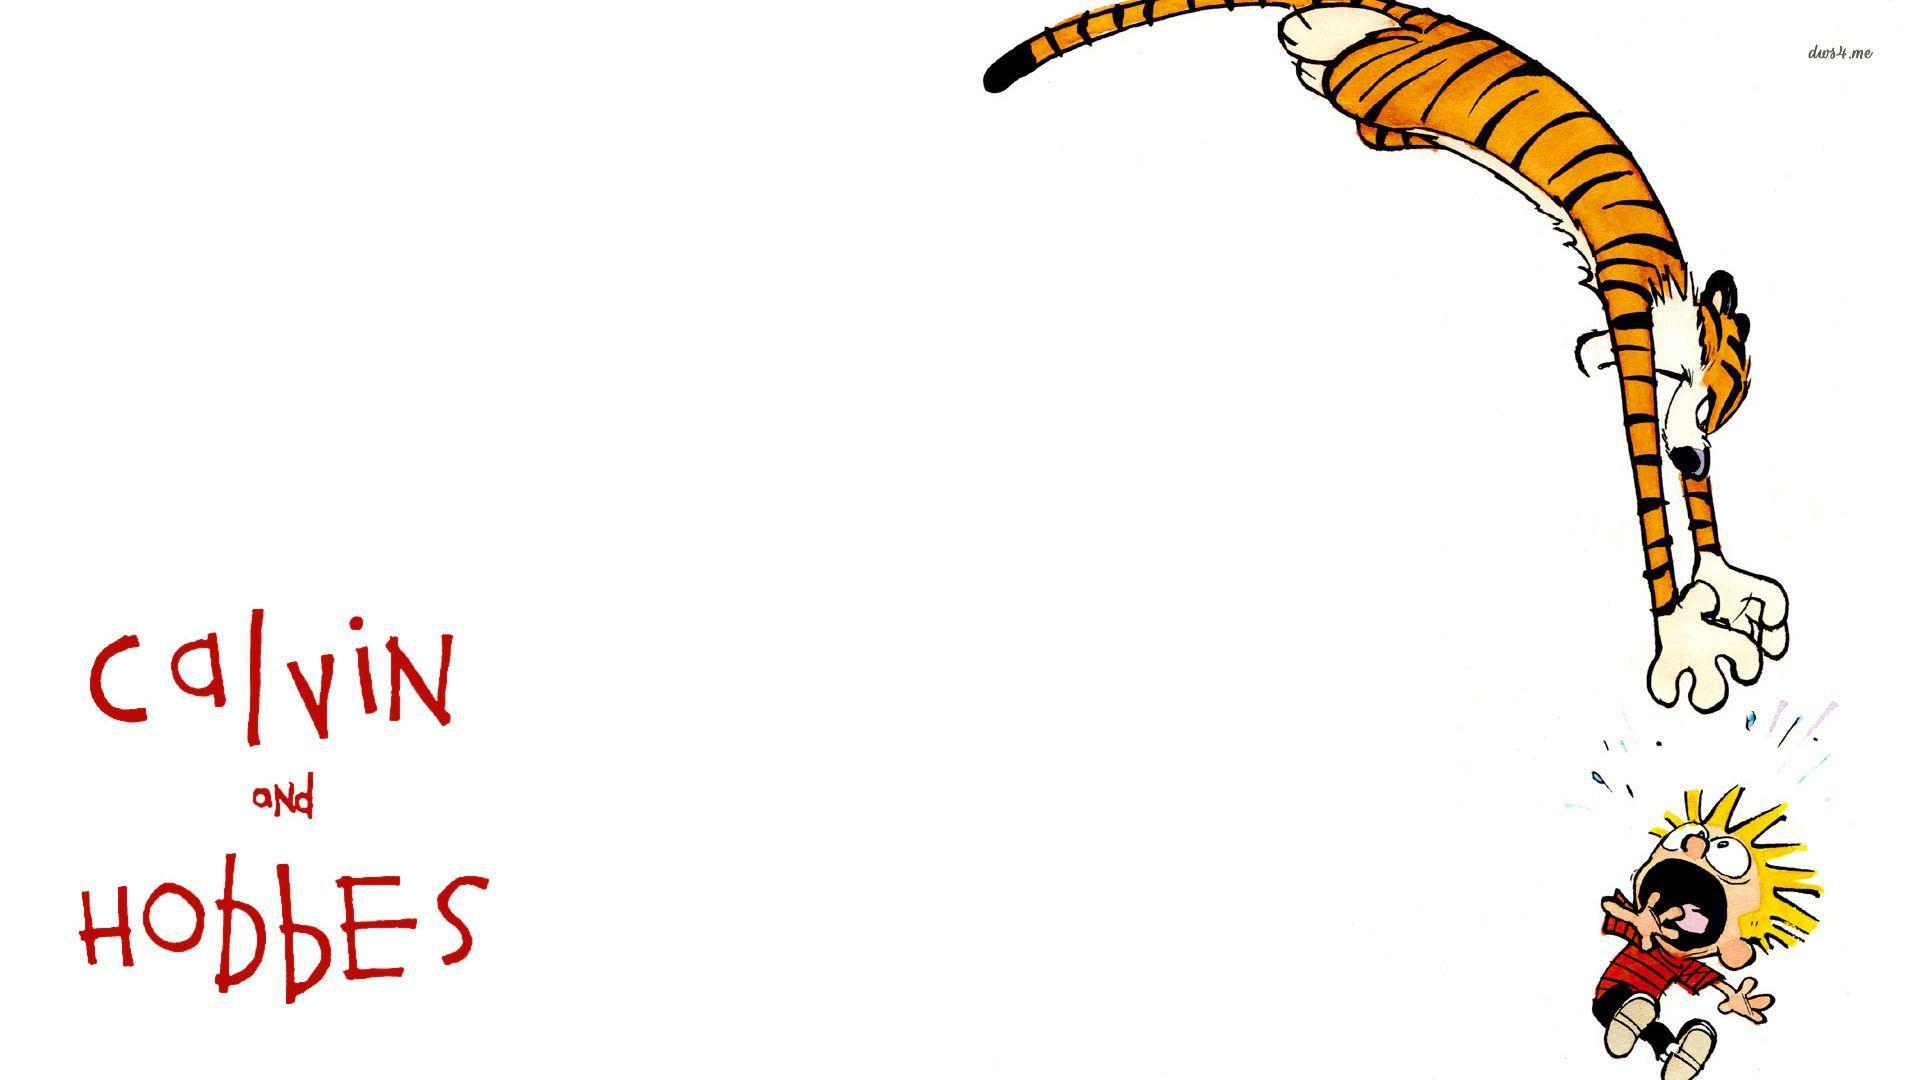 Calvin And Hobbs Wallpapers Top Free Calvin And Hobbs